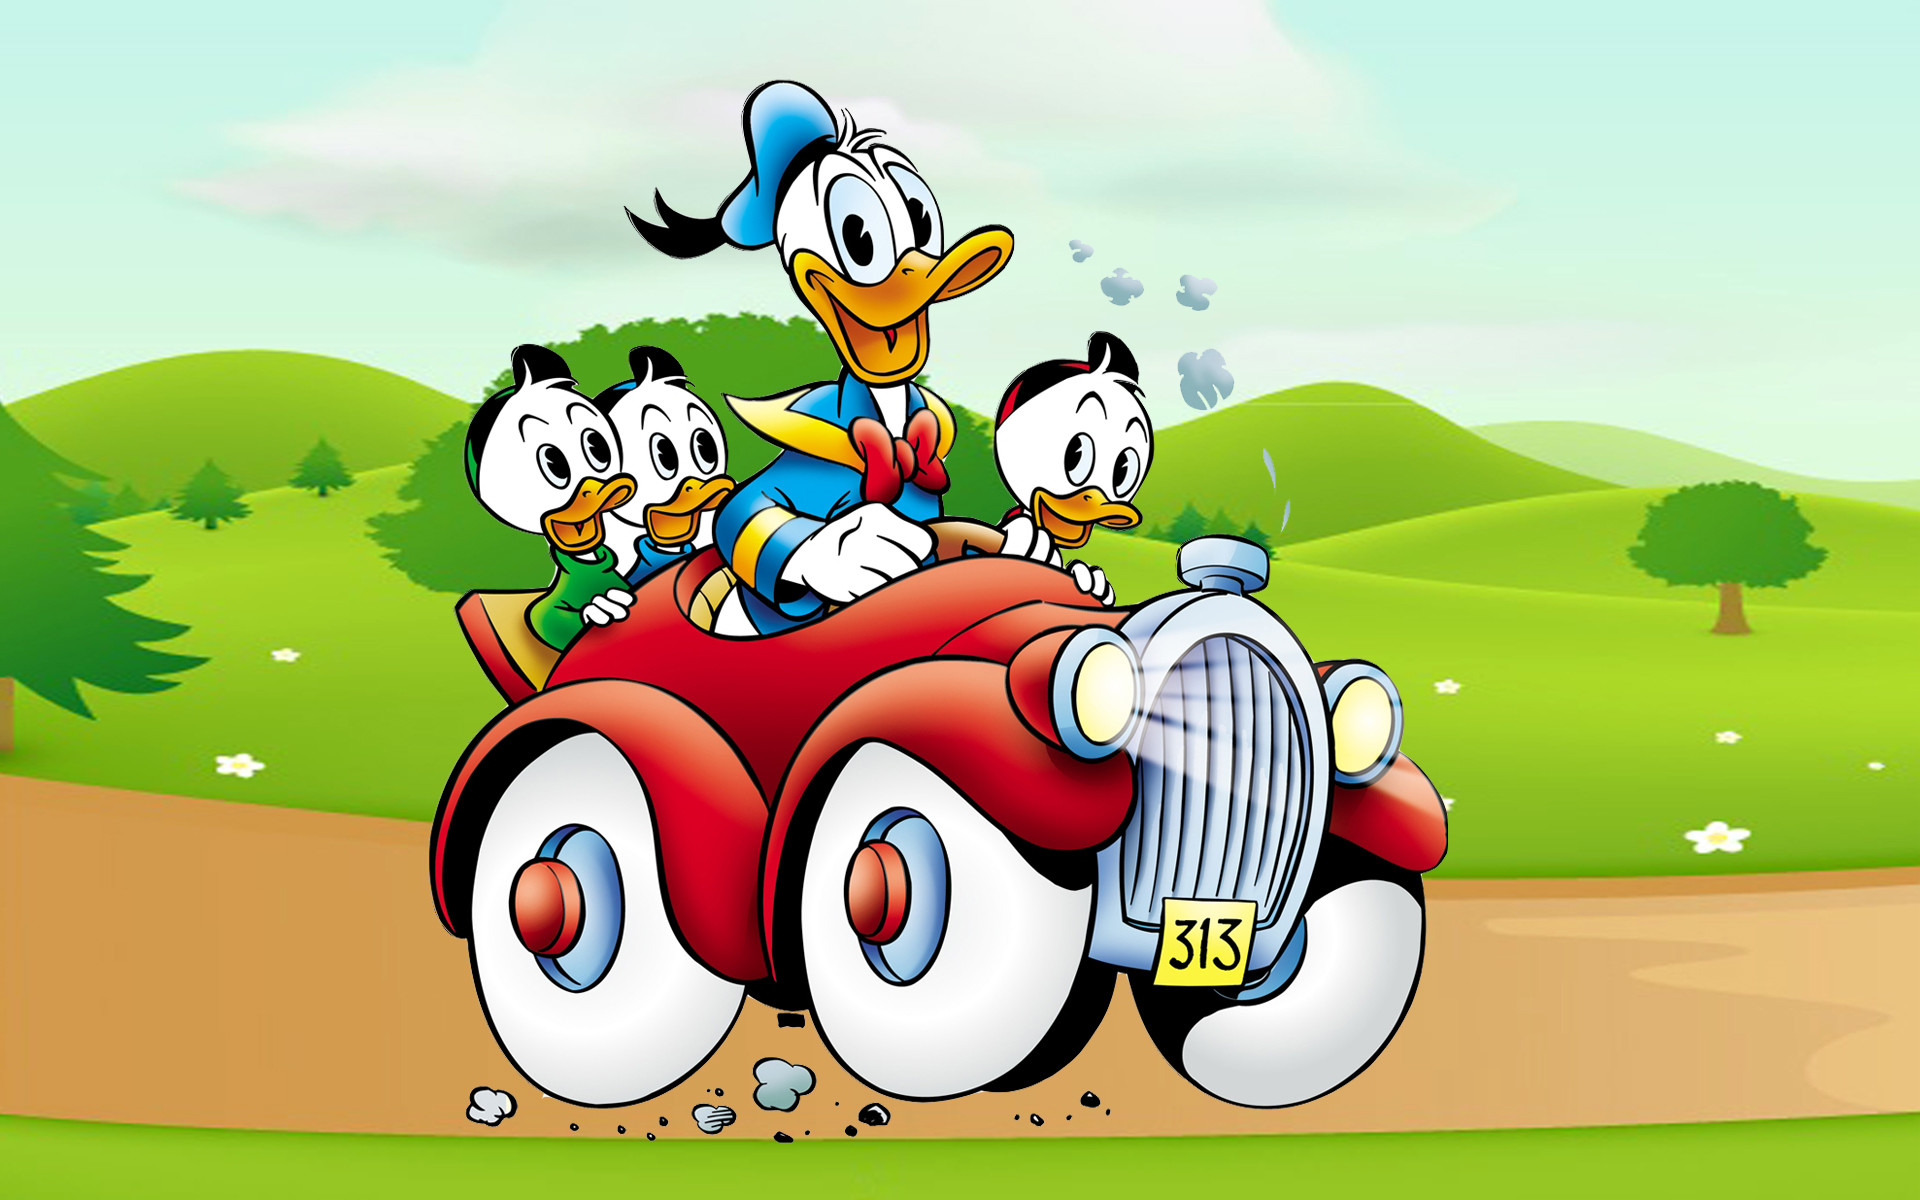 1920x1200 Donald Duck Cartoon Image